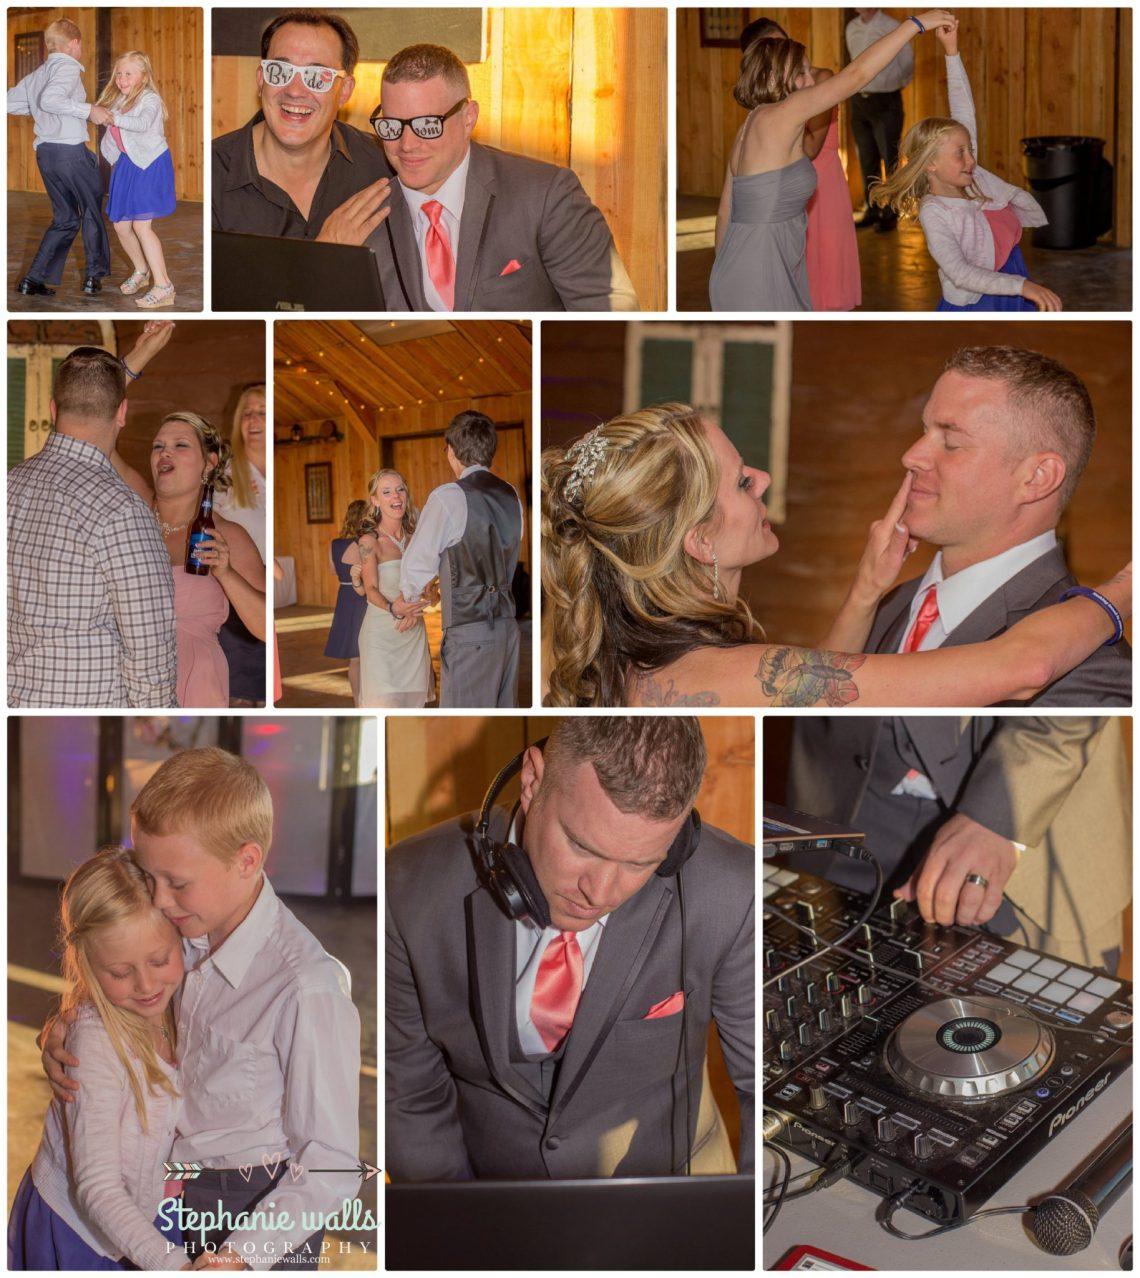 Baker Wedding 121 Blending Beats Together | Olympic View Estates Snohomish WA